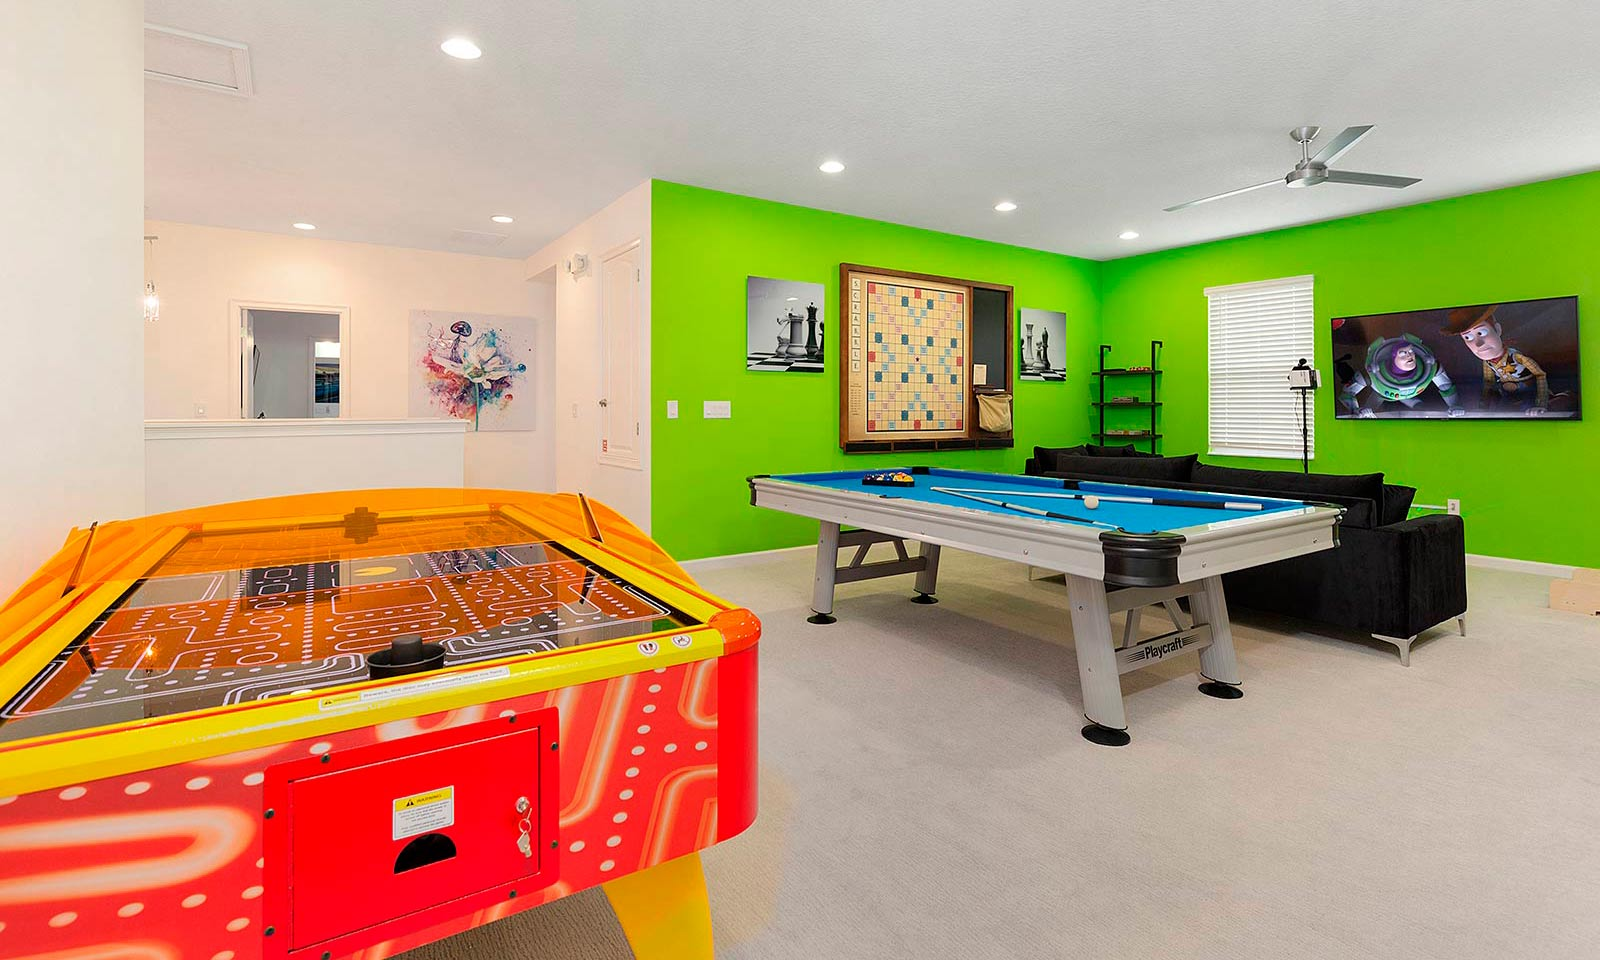 [amenities:Entertainment-Loft:2] Entertainment Loft